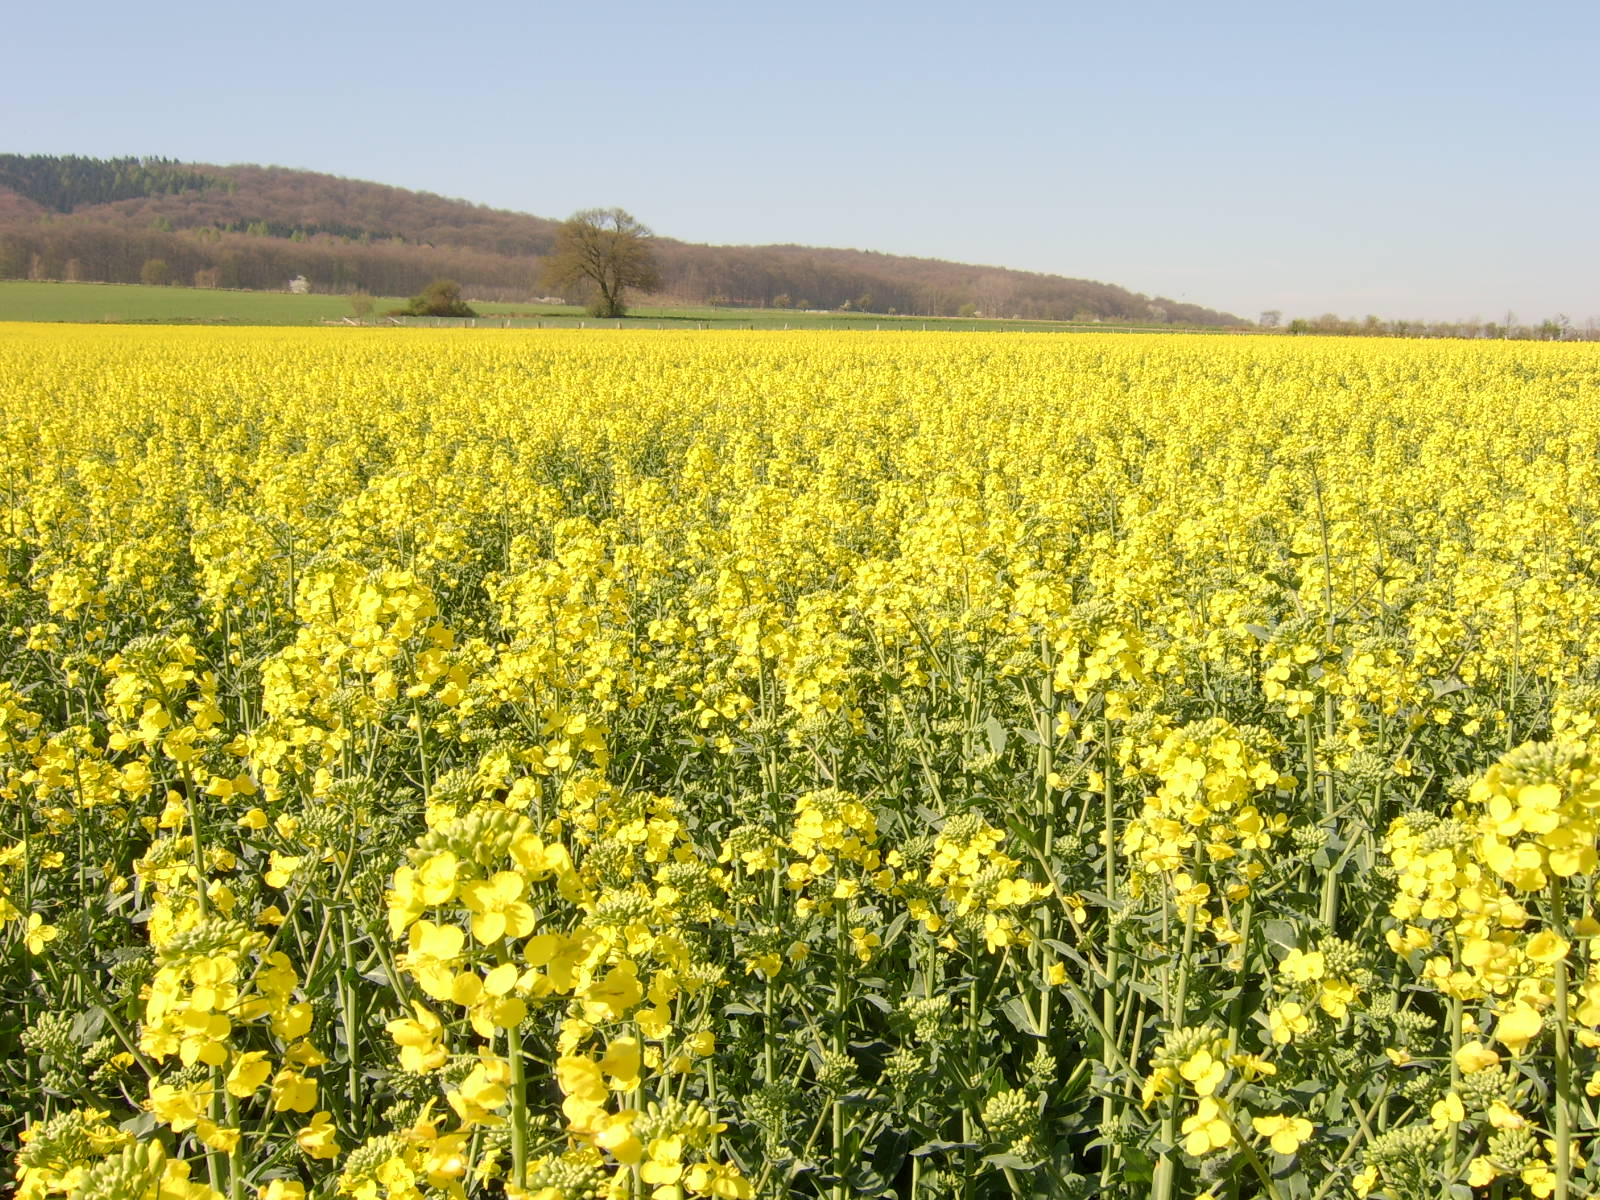 Nature flowers fields yellow field yellow flowers ...